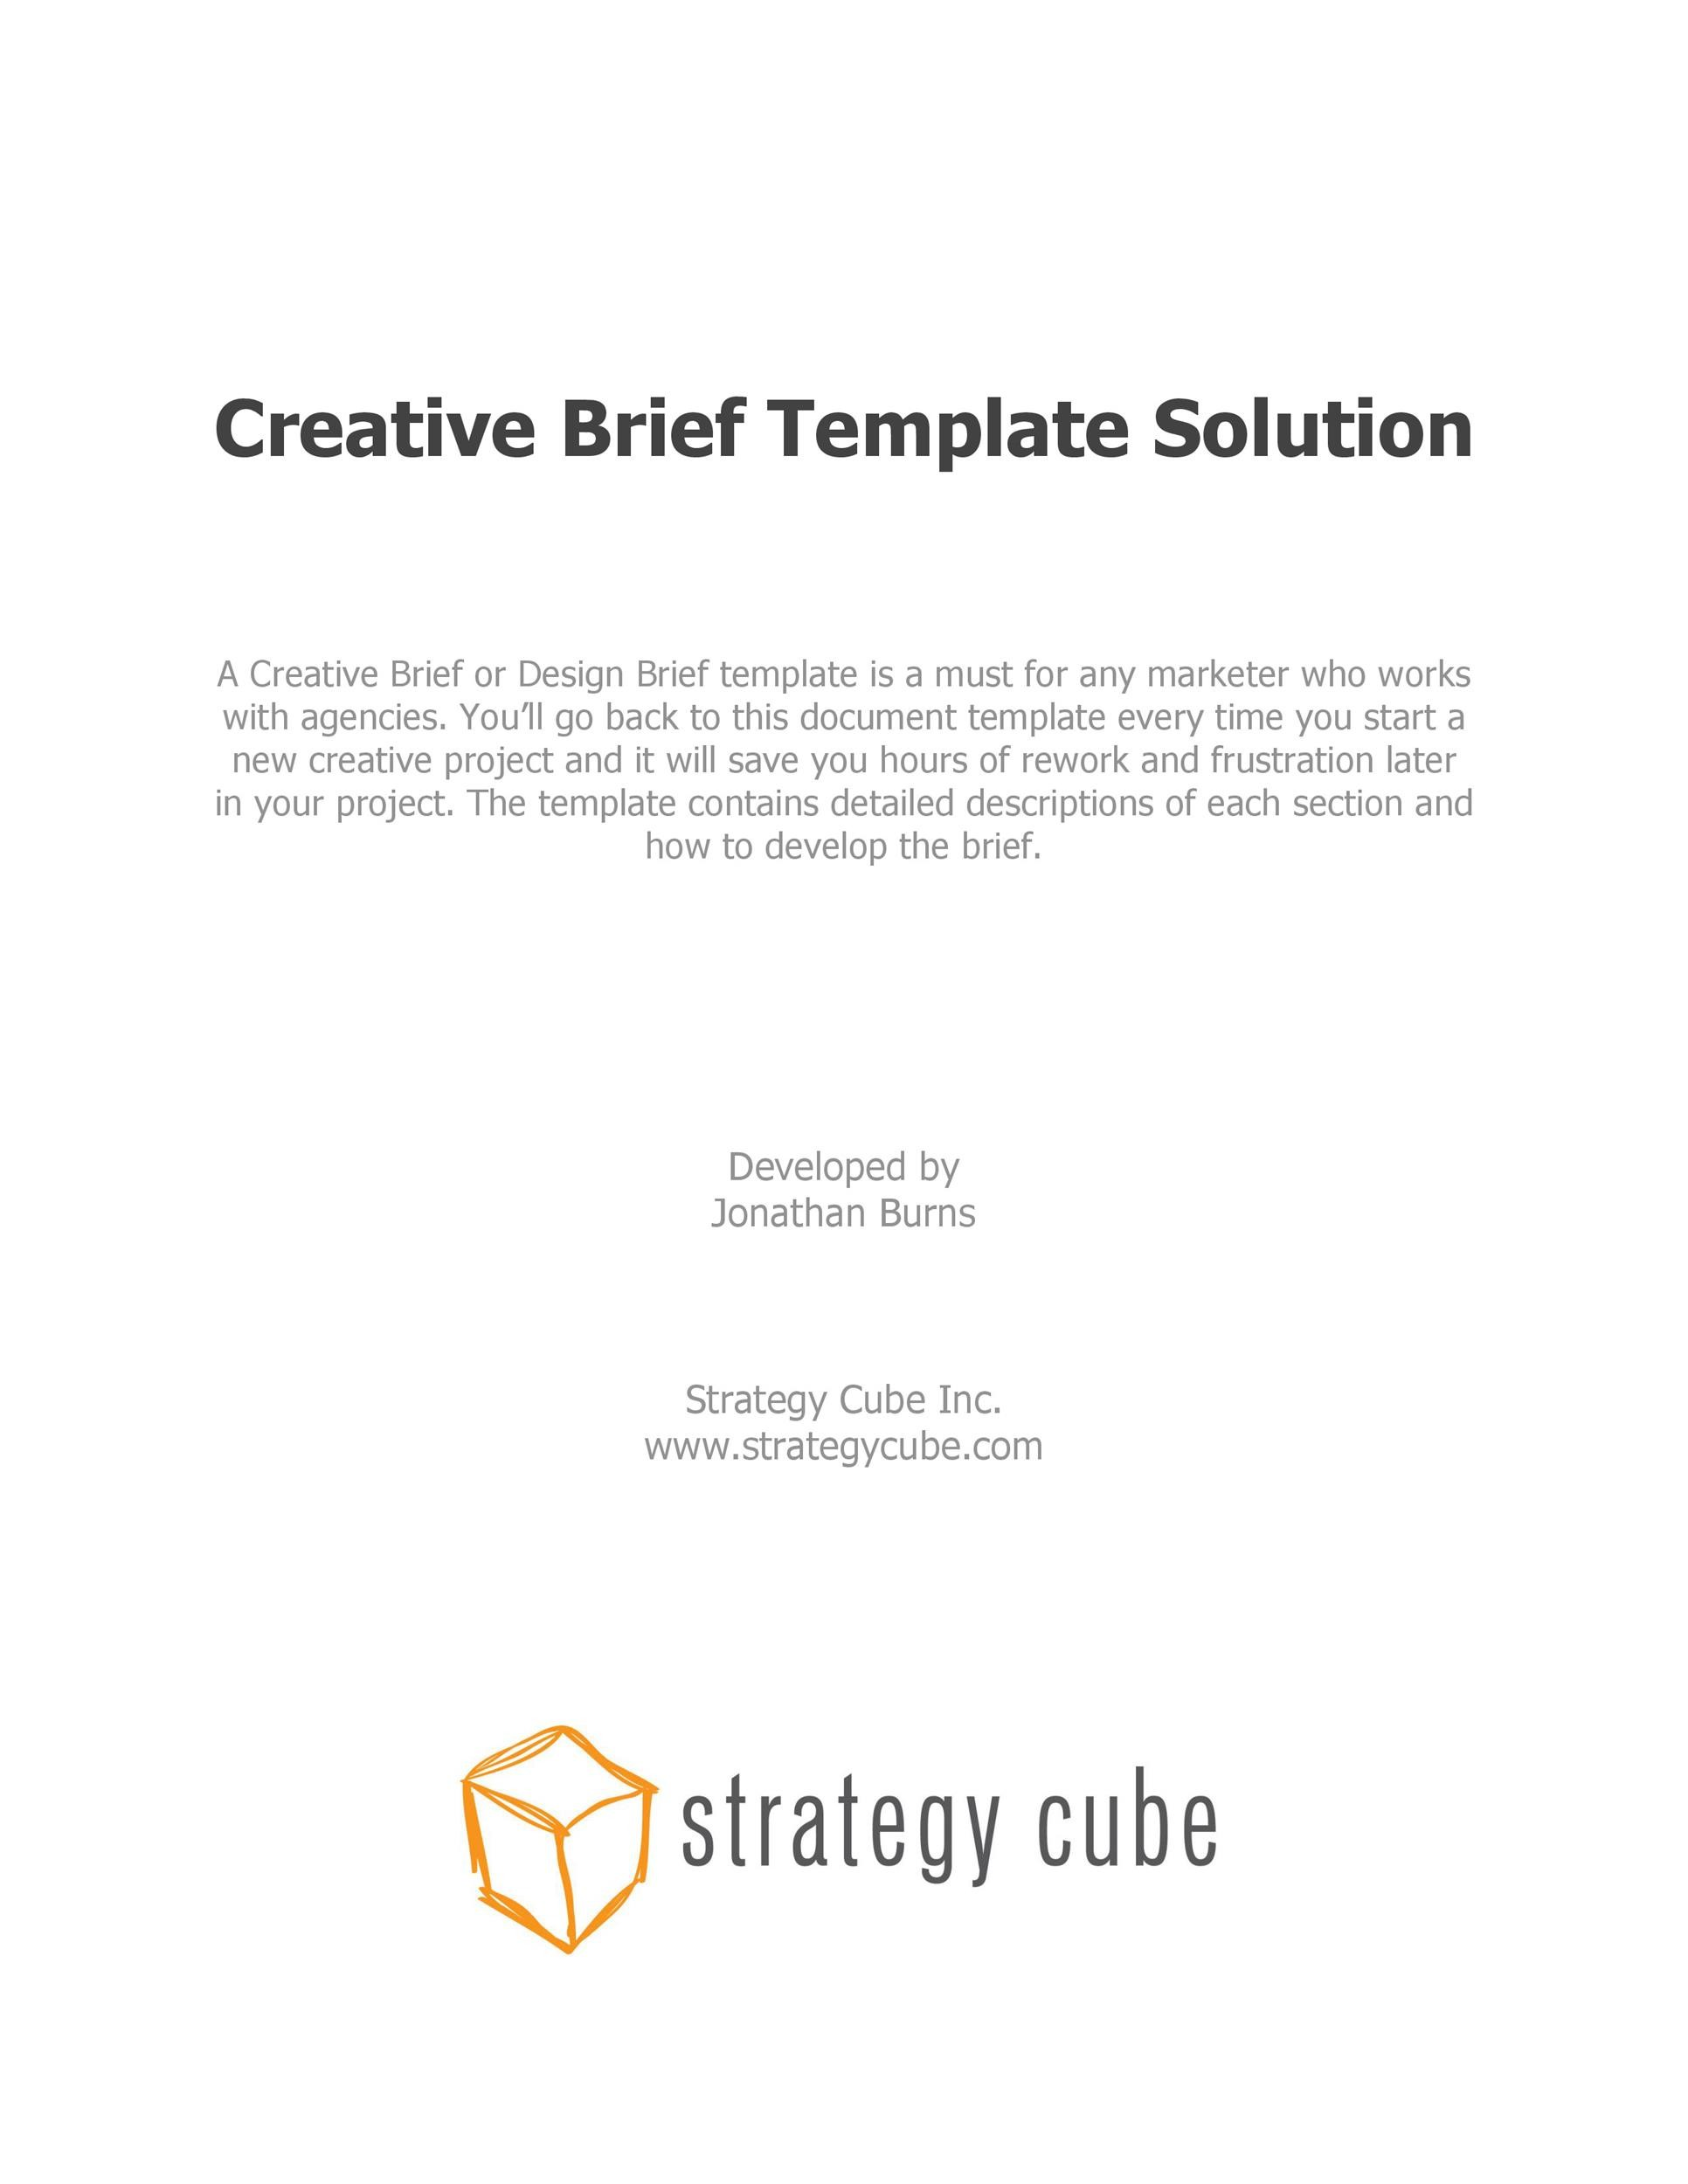 Free design brief template 31